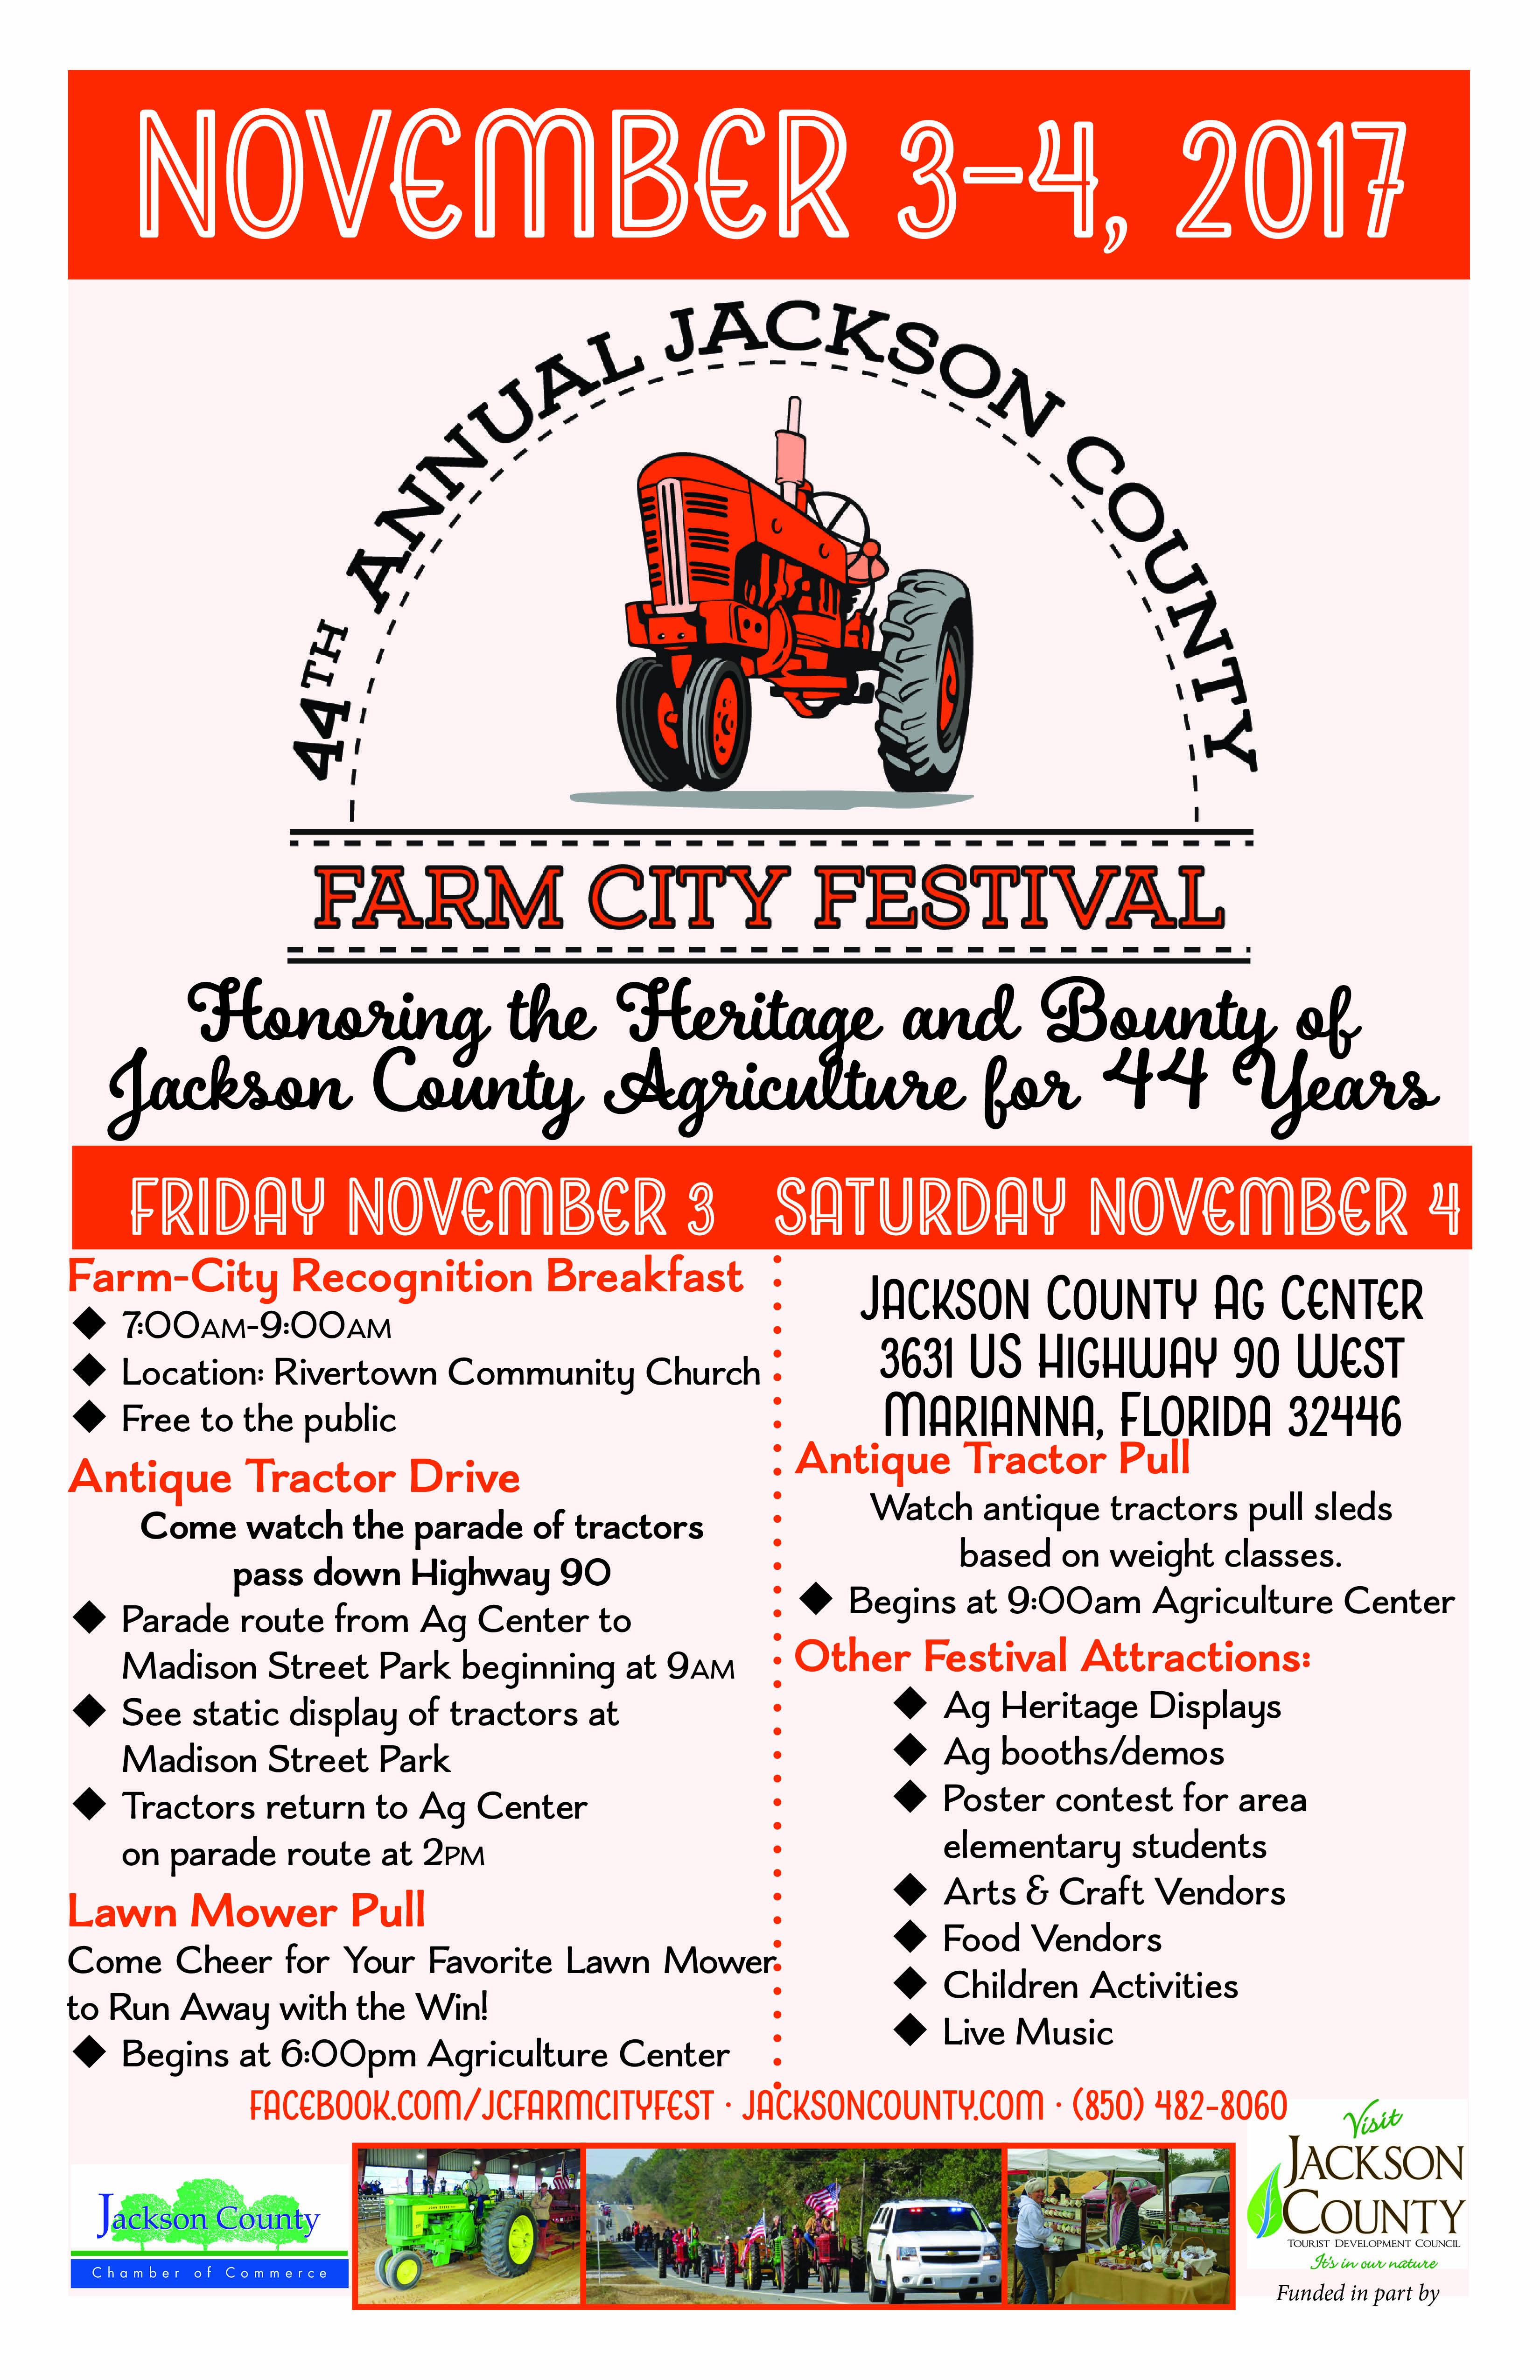 Farm-City-11x17-Poster.jpg